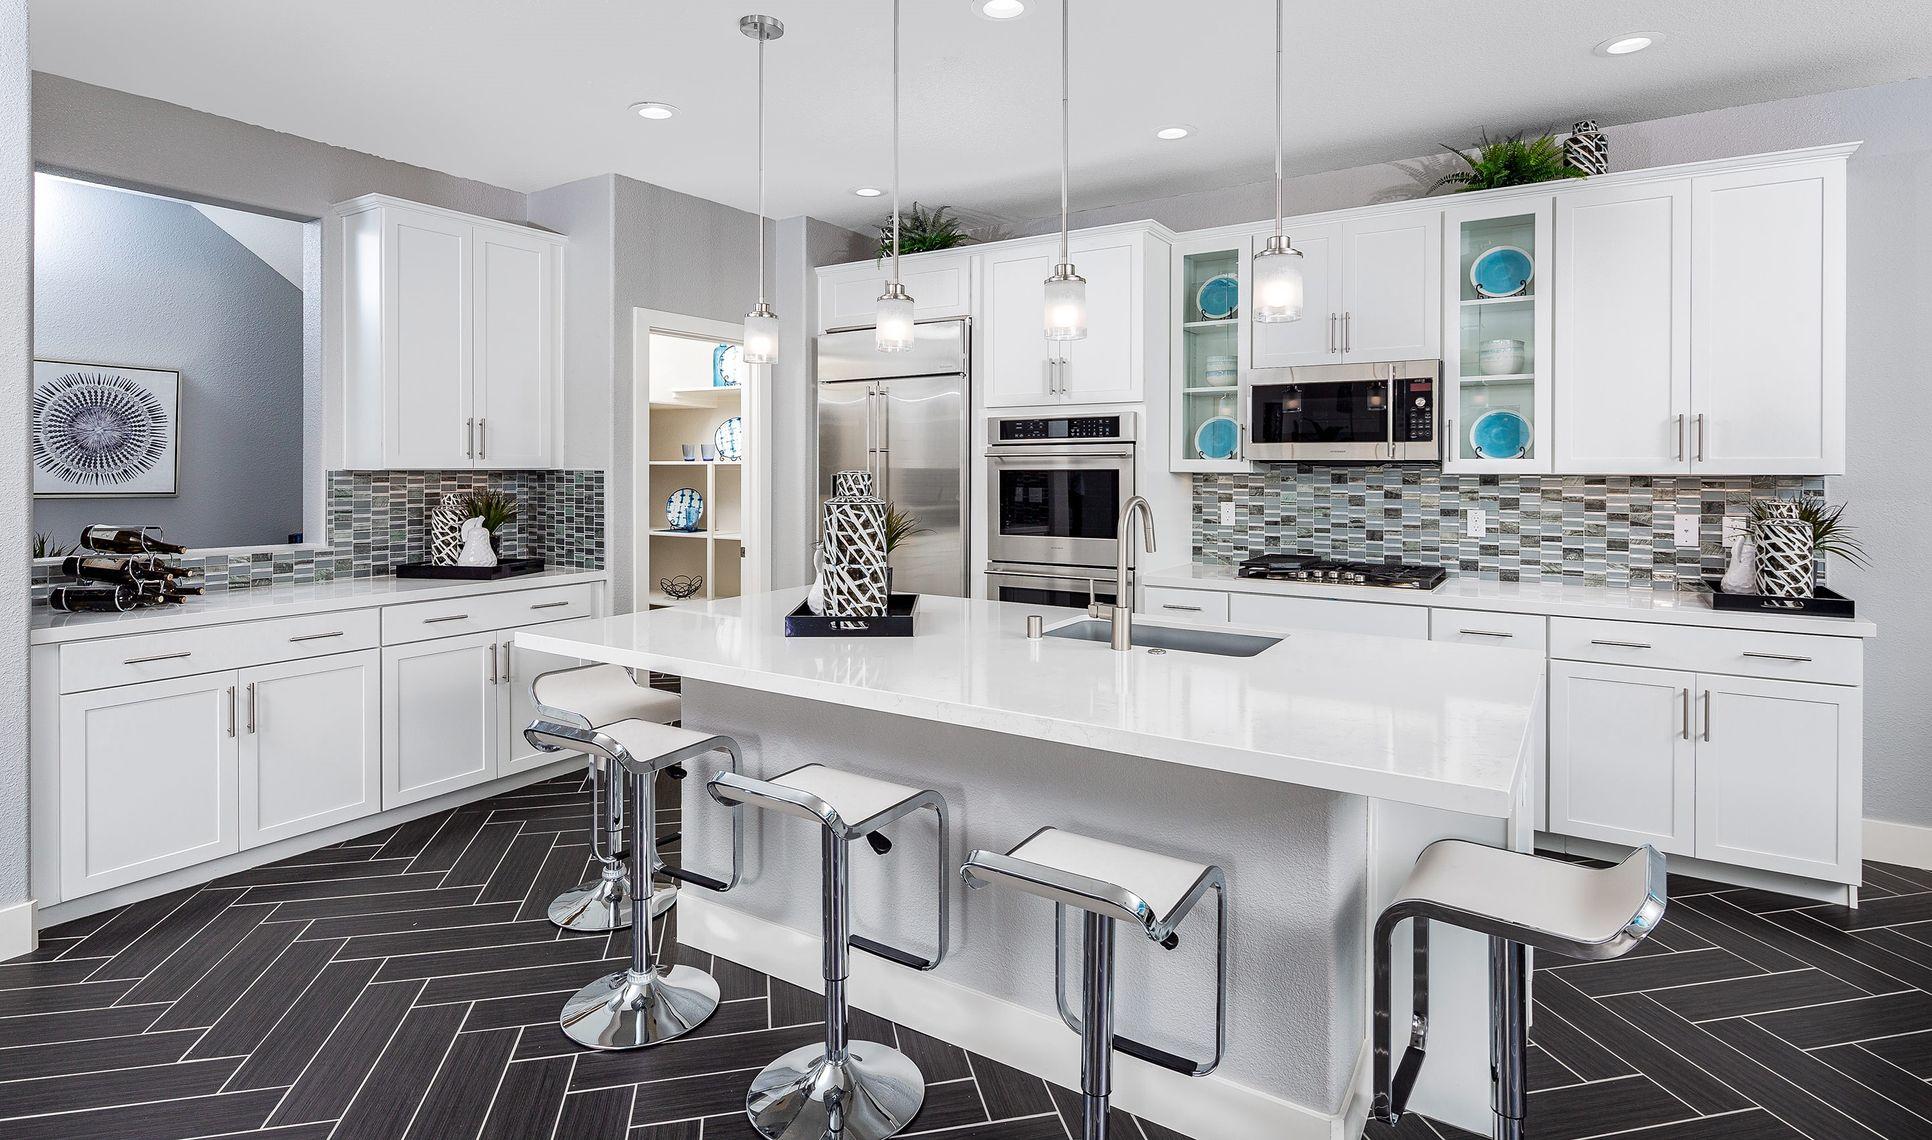 Interior:Refined kitchen with island